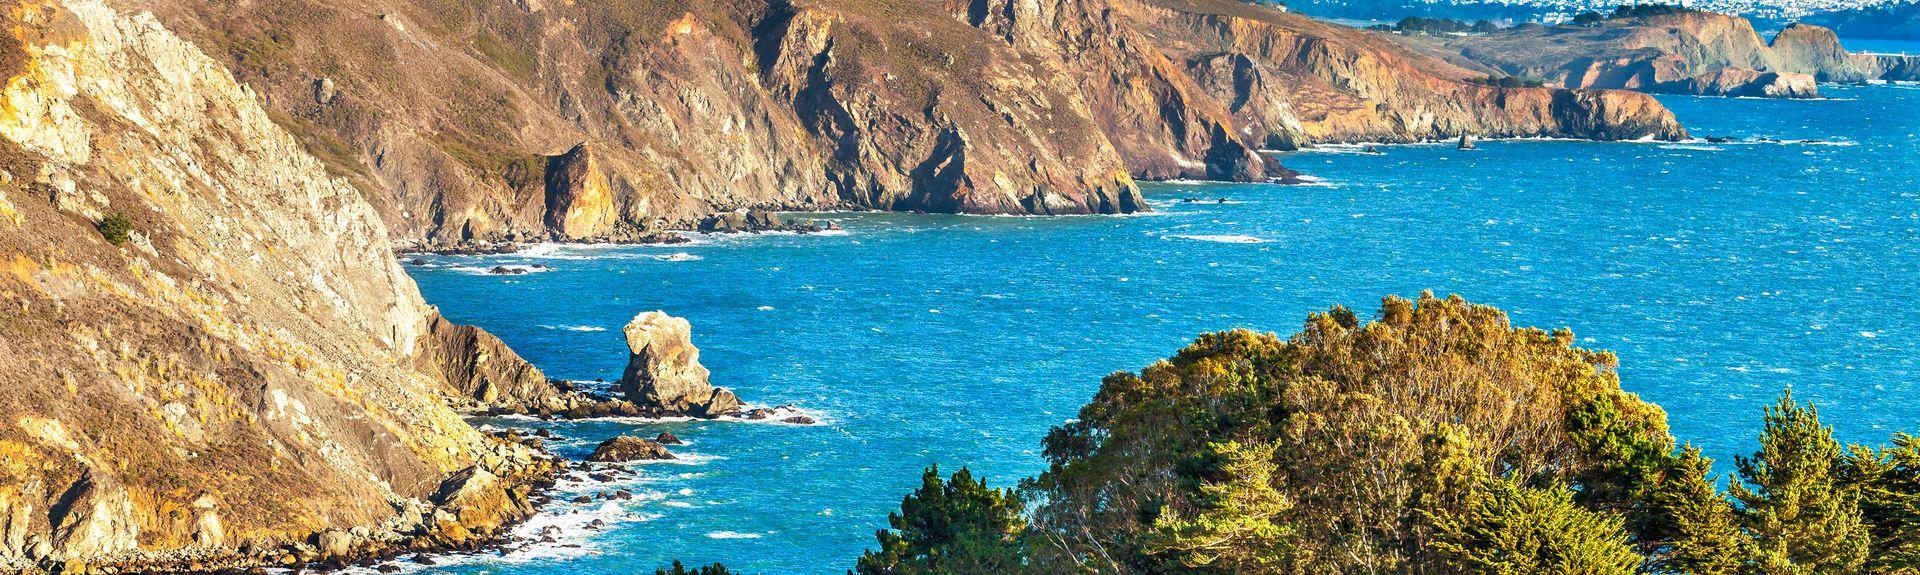 Marin County, Californië, Verenigde Staten